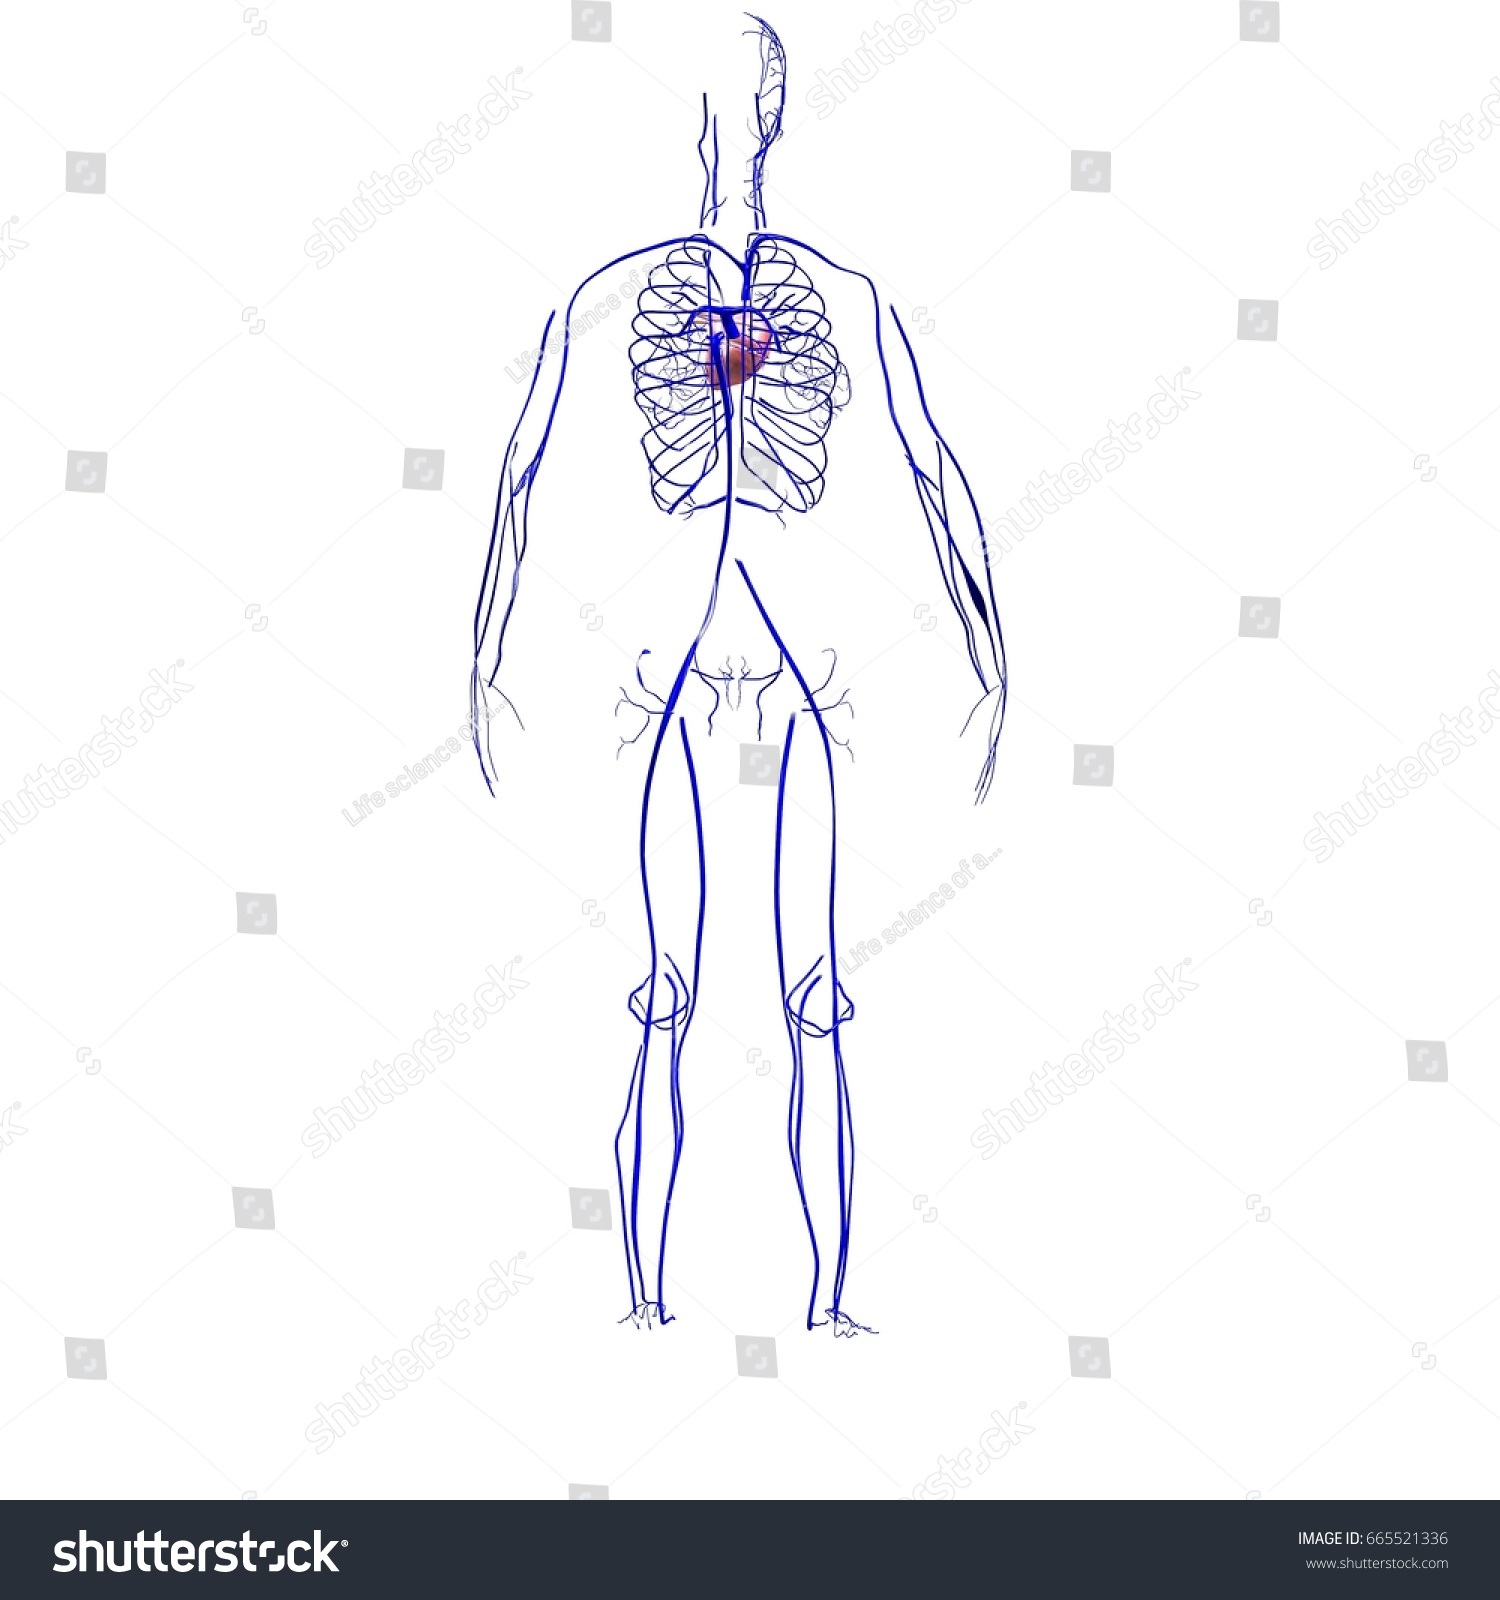 3 D Illustration Human Body Nerves Anatomy Stock Illustration